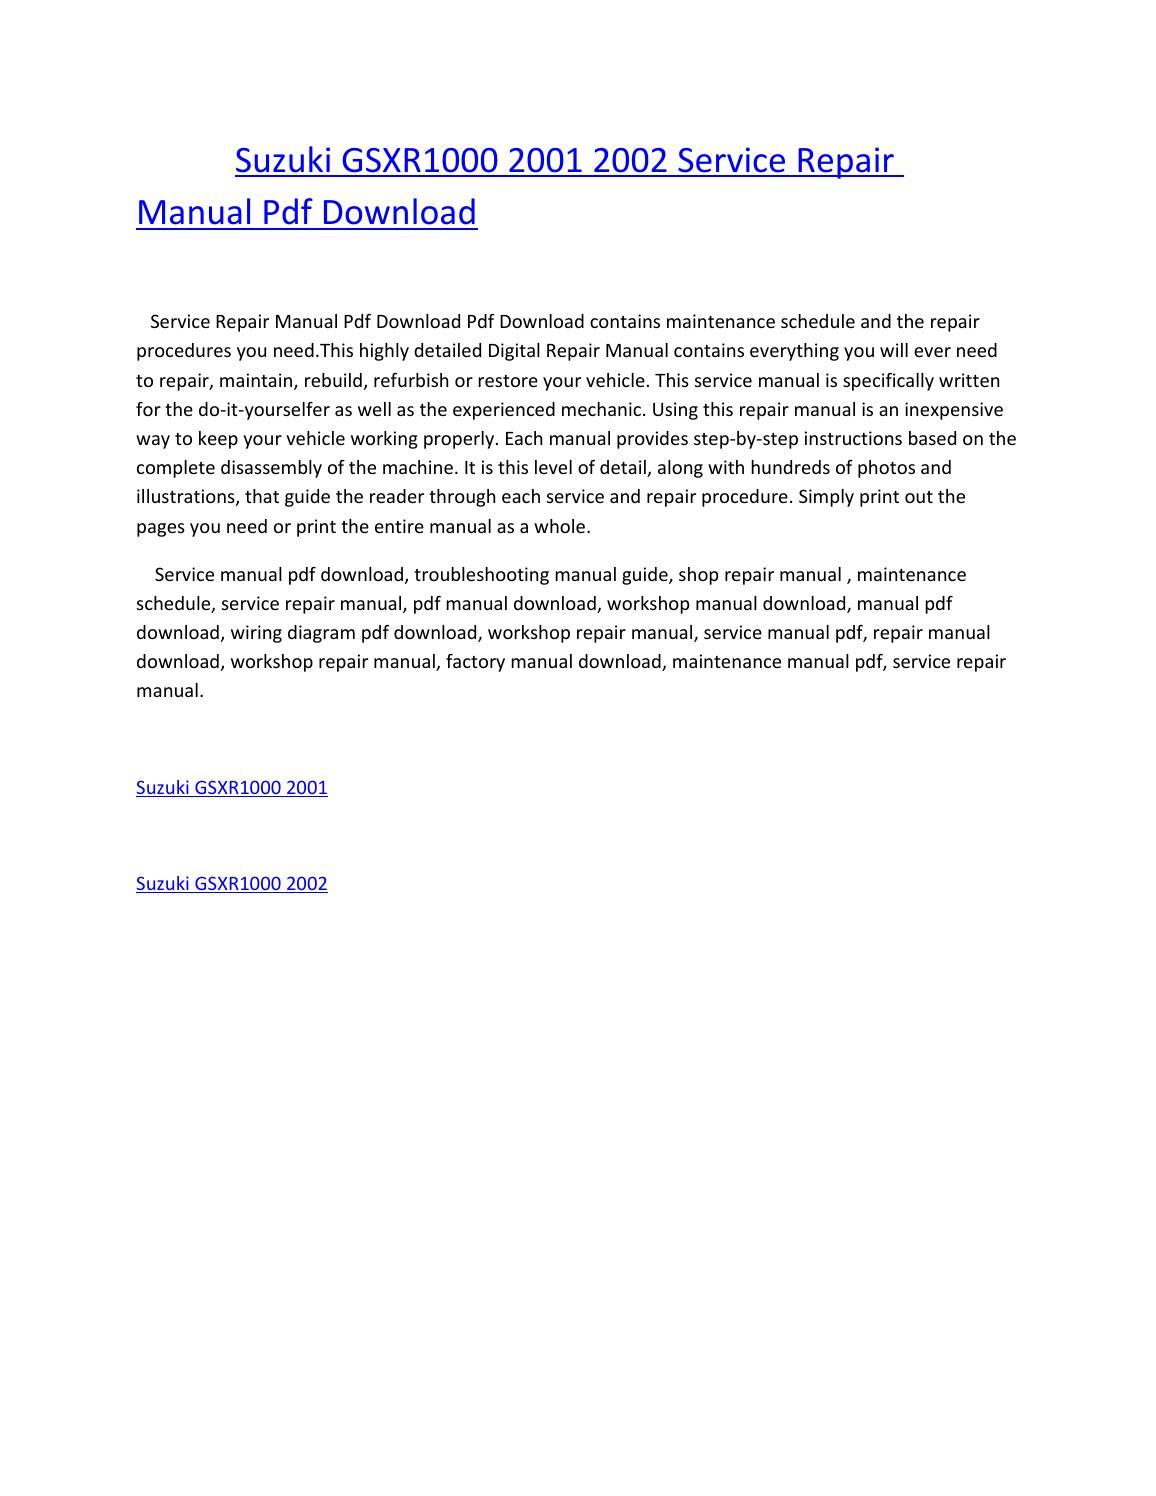 hight resolution of suzuki gsxr1000 2001 2002 service repair manual pdf download by amurgului issuu